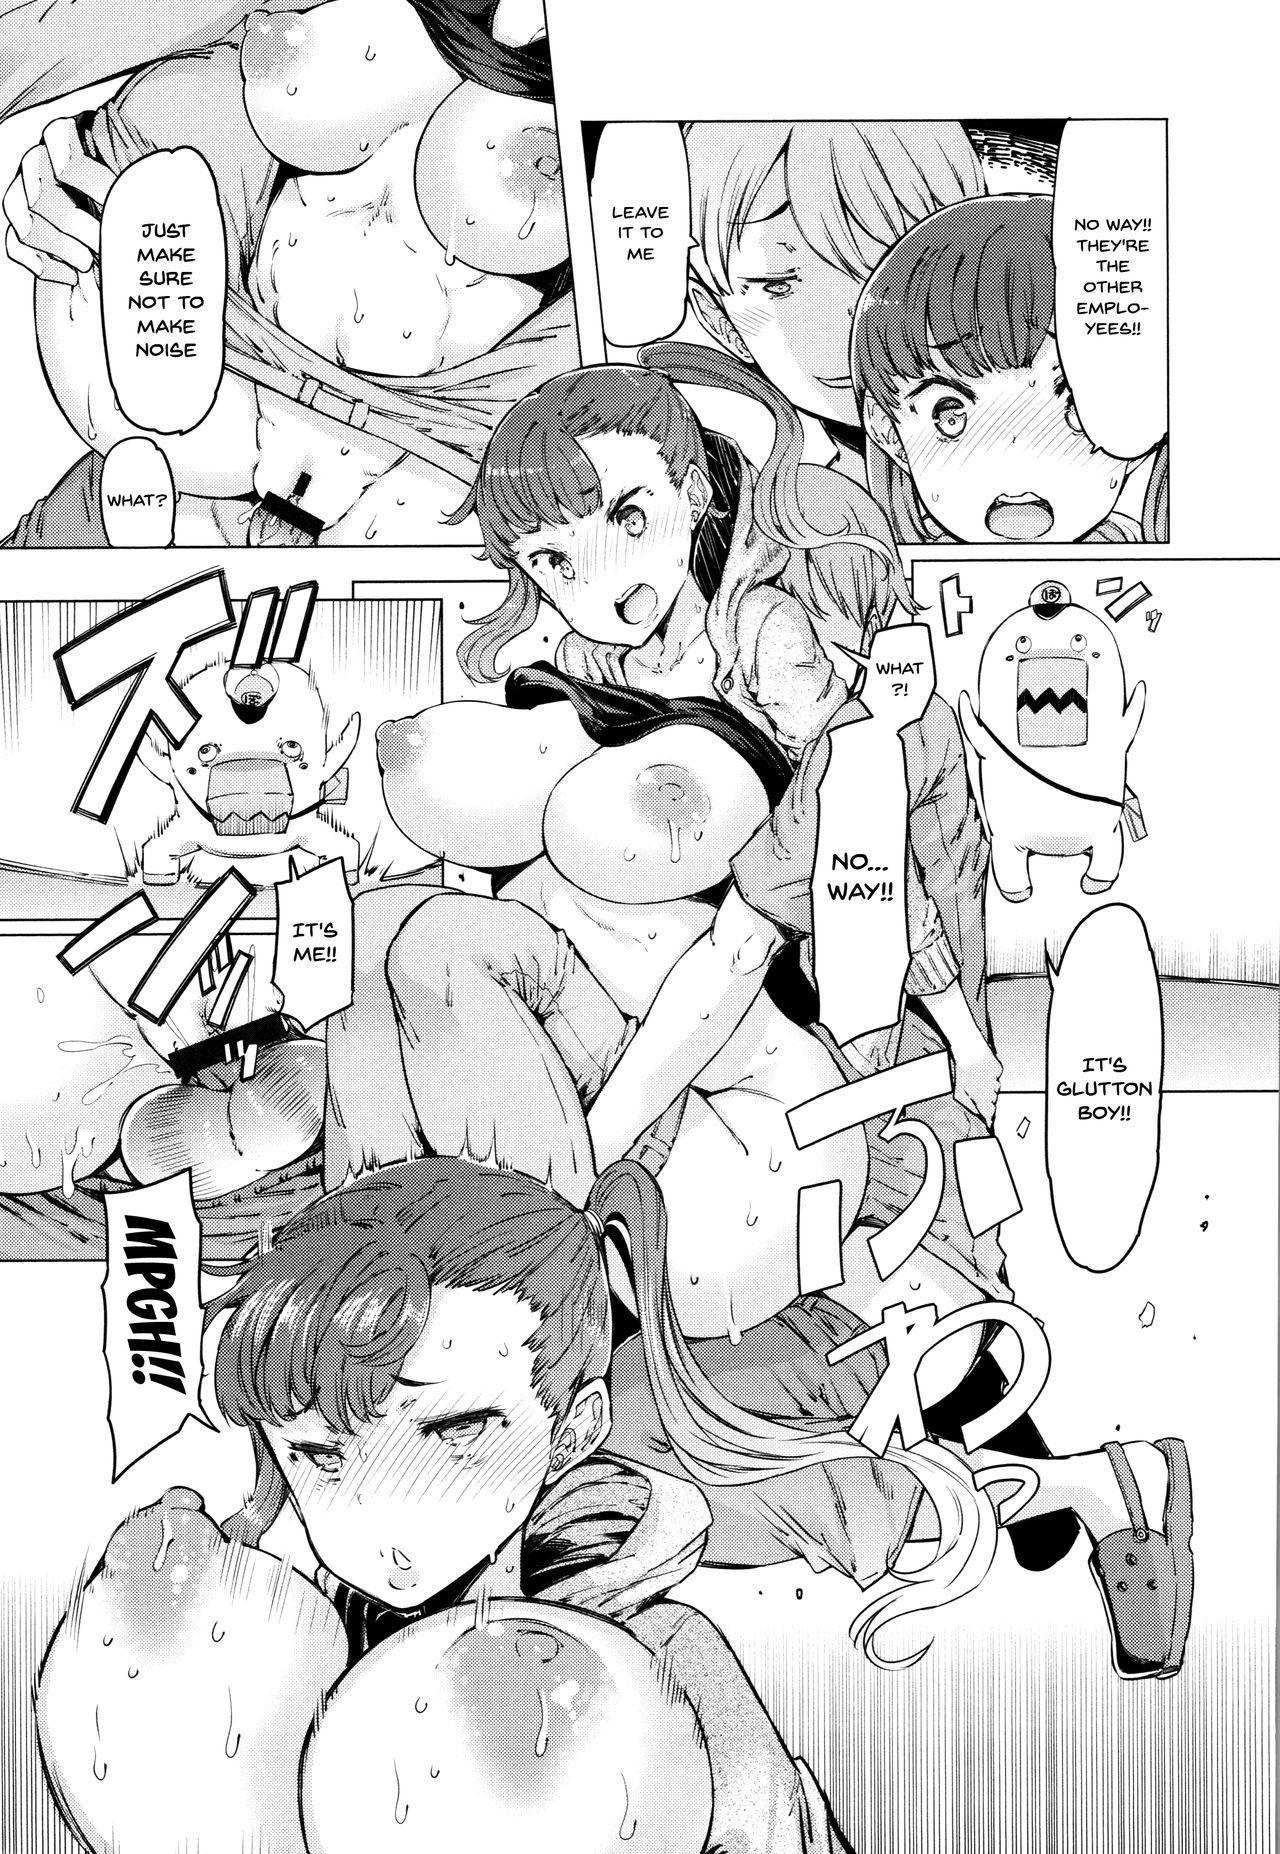 Hitozuma ga Ero Sugite Shigoto ni Naranai! | These Housewives Are Too Lewd I Can't Help It! 34